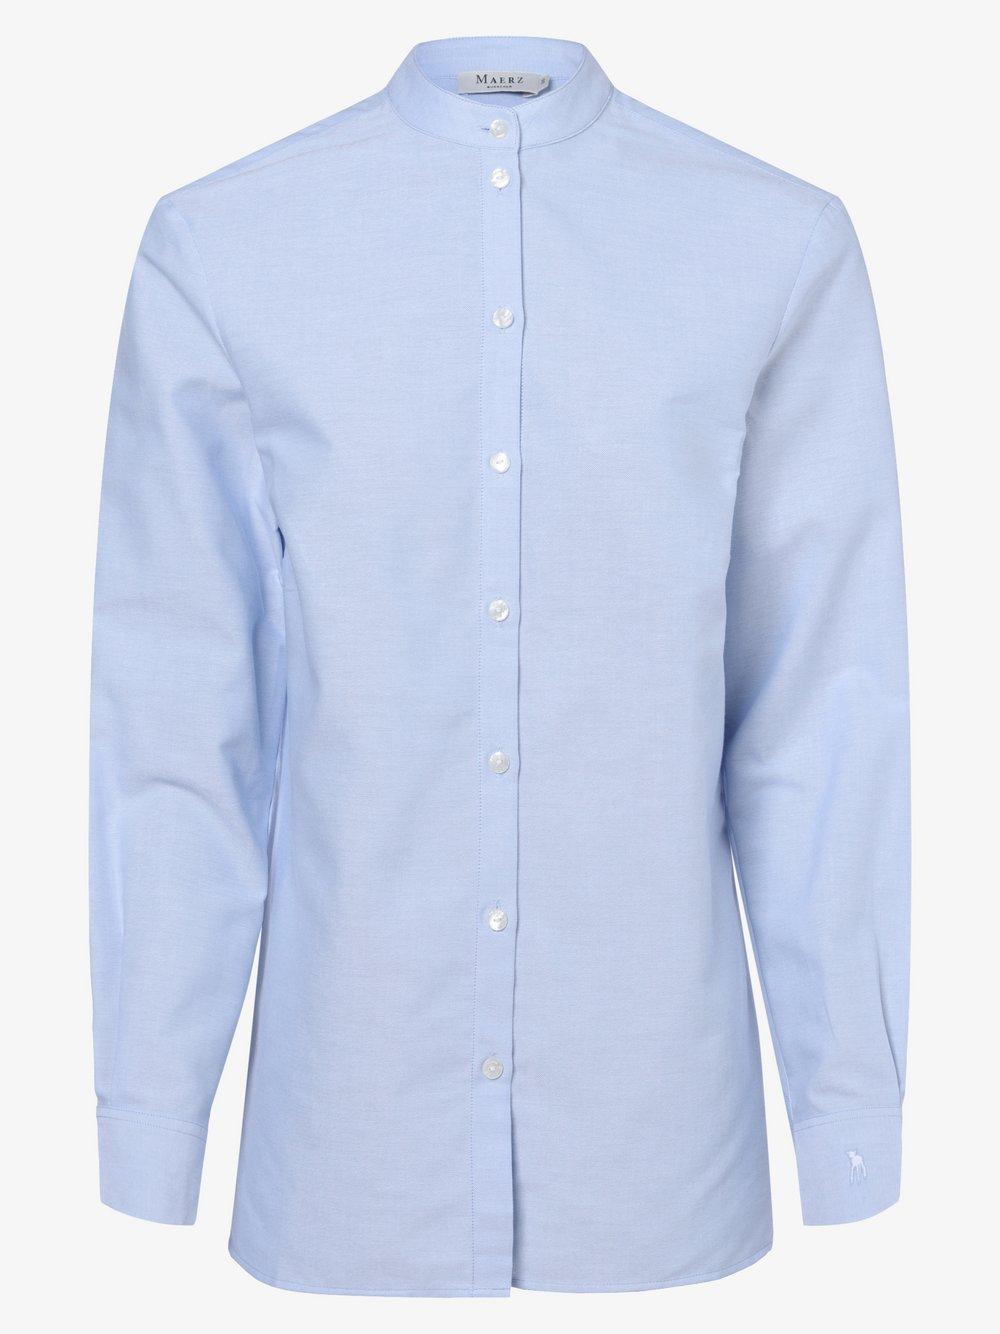 März – Bluzka damska, niebieski Van Graaf 485520-0003-00440